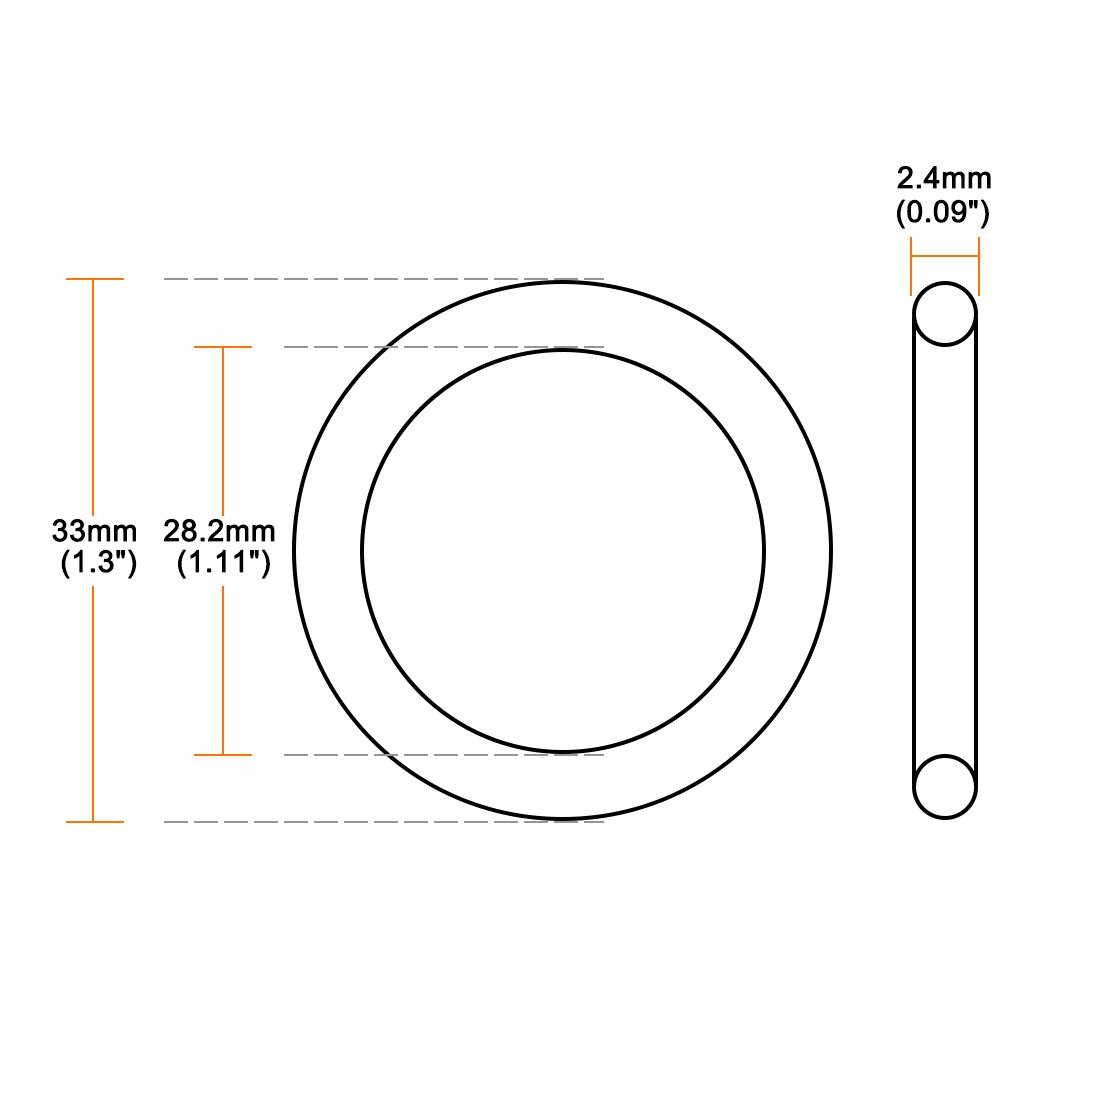 55.2mm Inner Diameter 2.4mm Width sourcingmap Silicone O-Ring 10PCS 60mm Outside Diameter VMQ Seal Rings Sealing Gasket Red